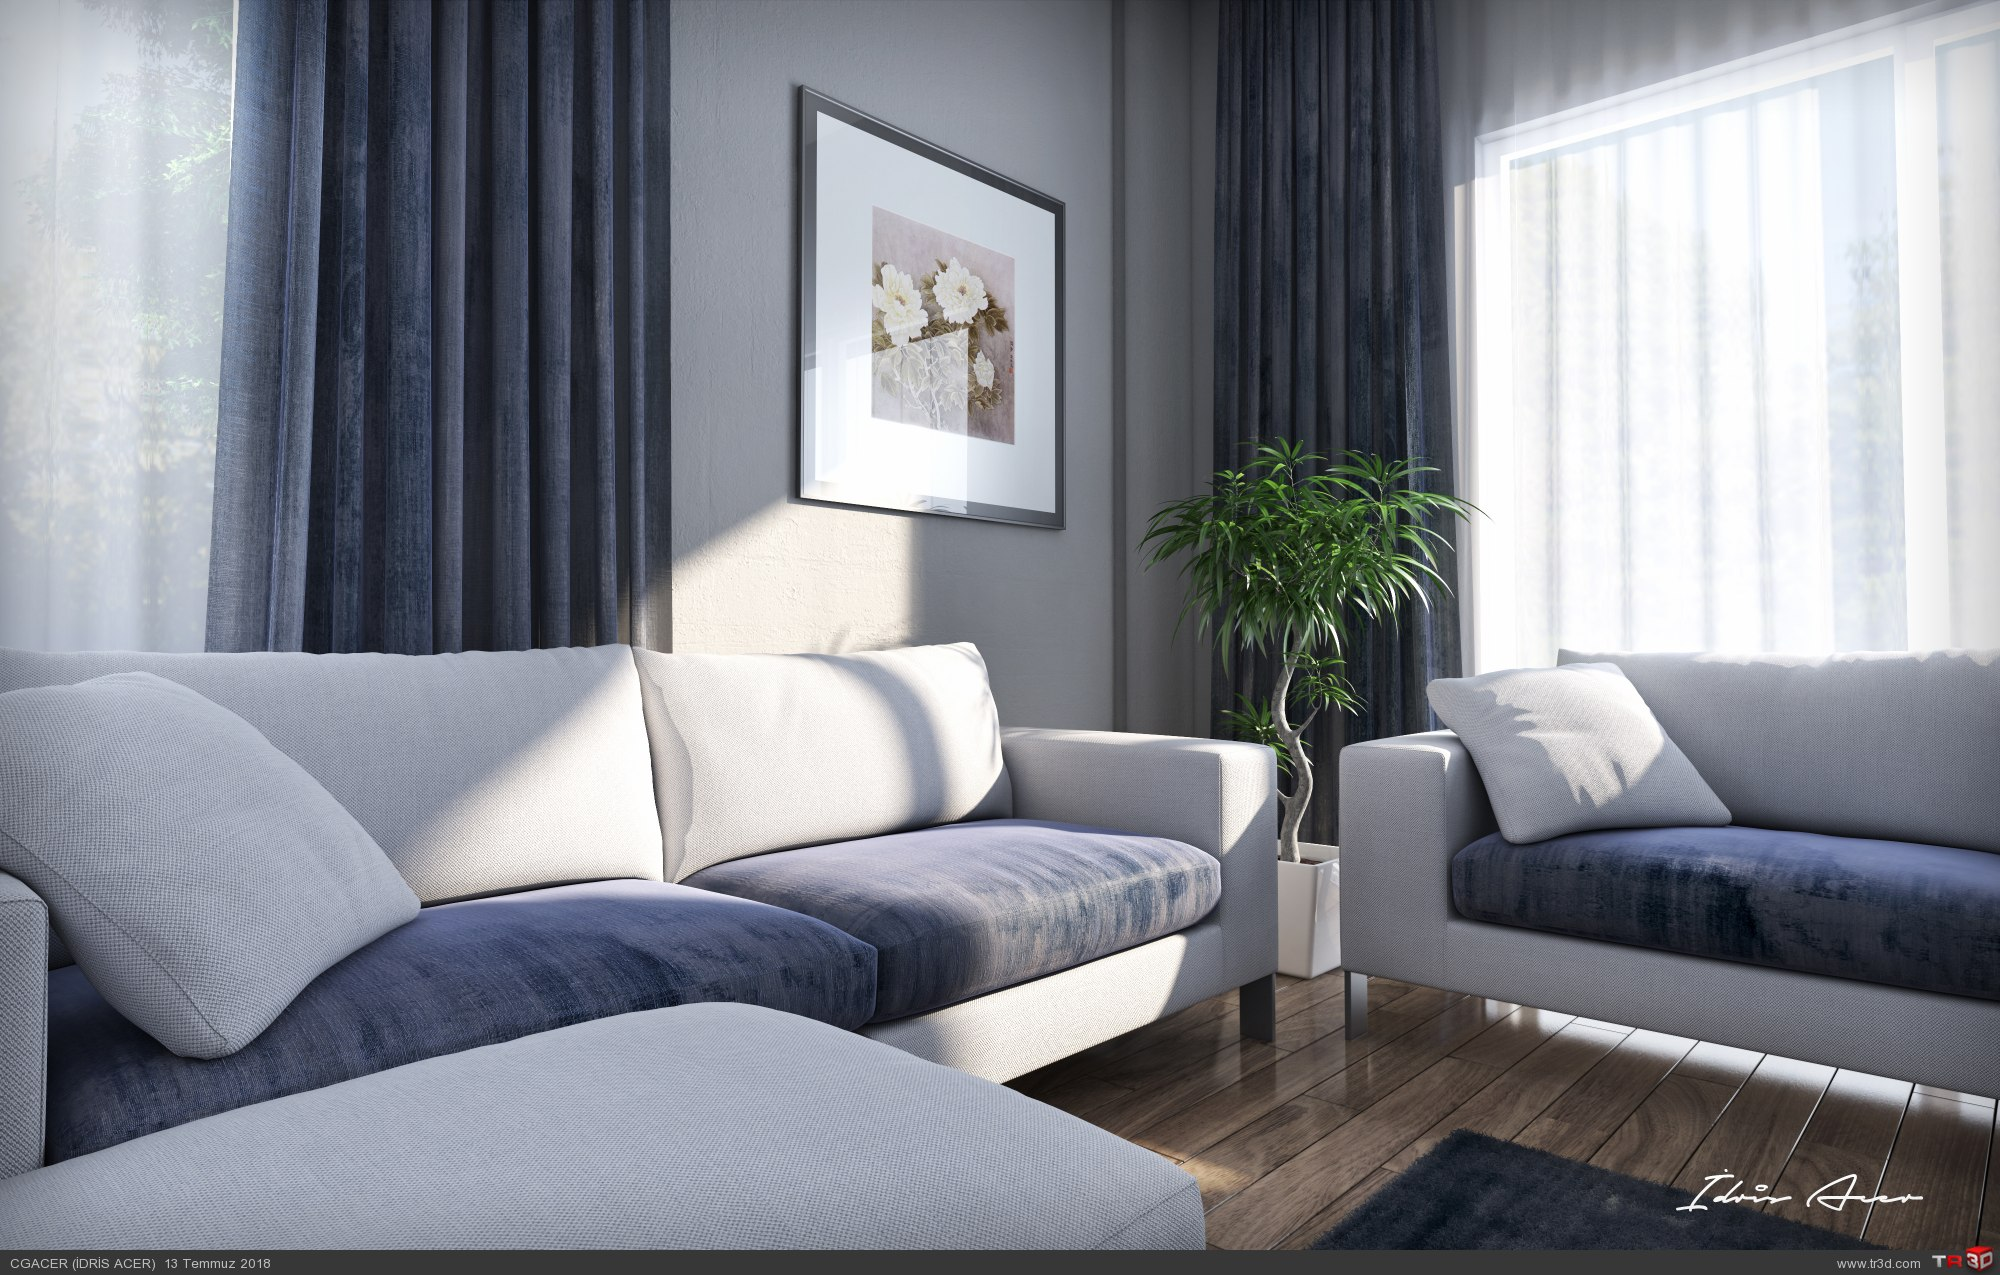 Nevizade Living Room 2